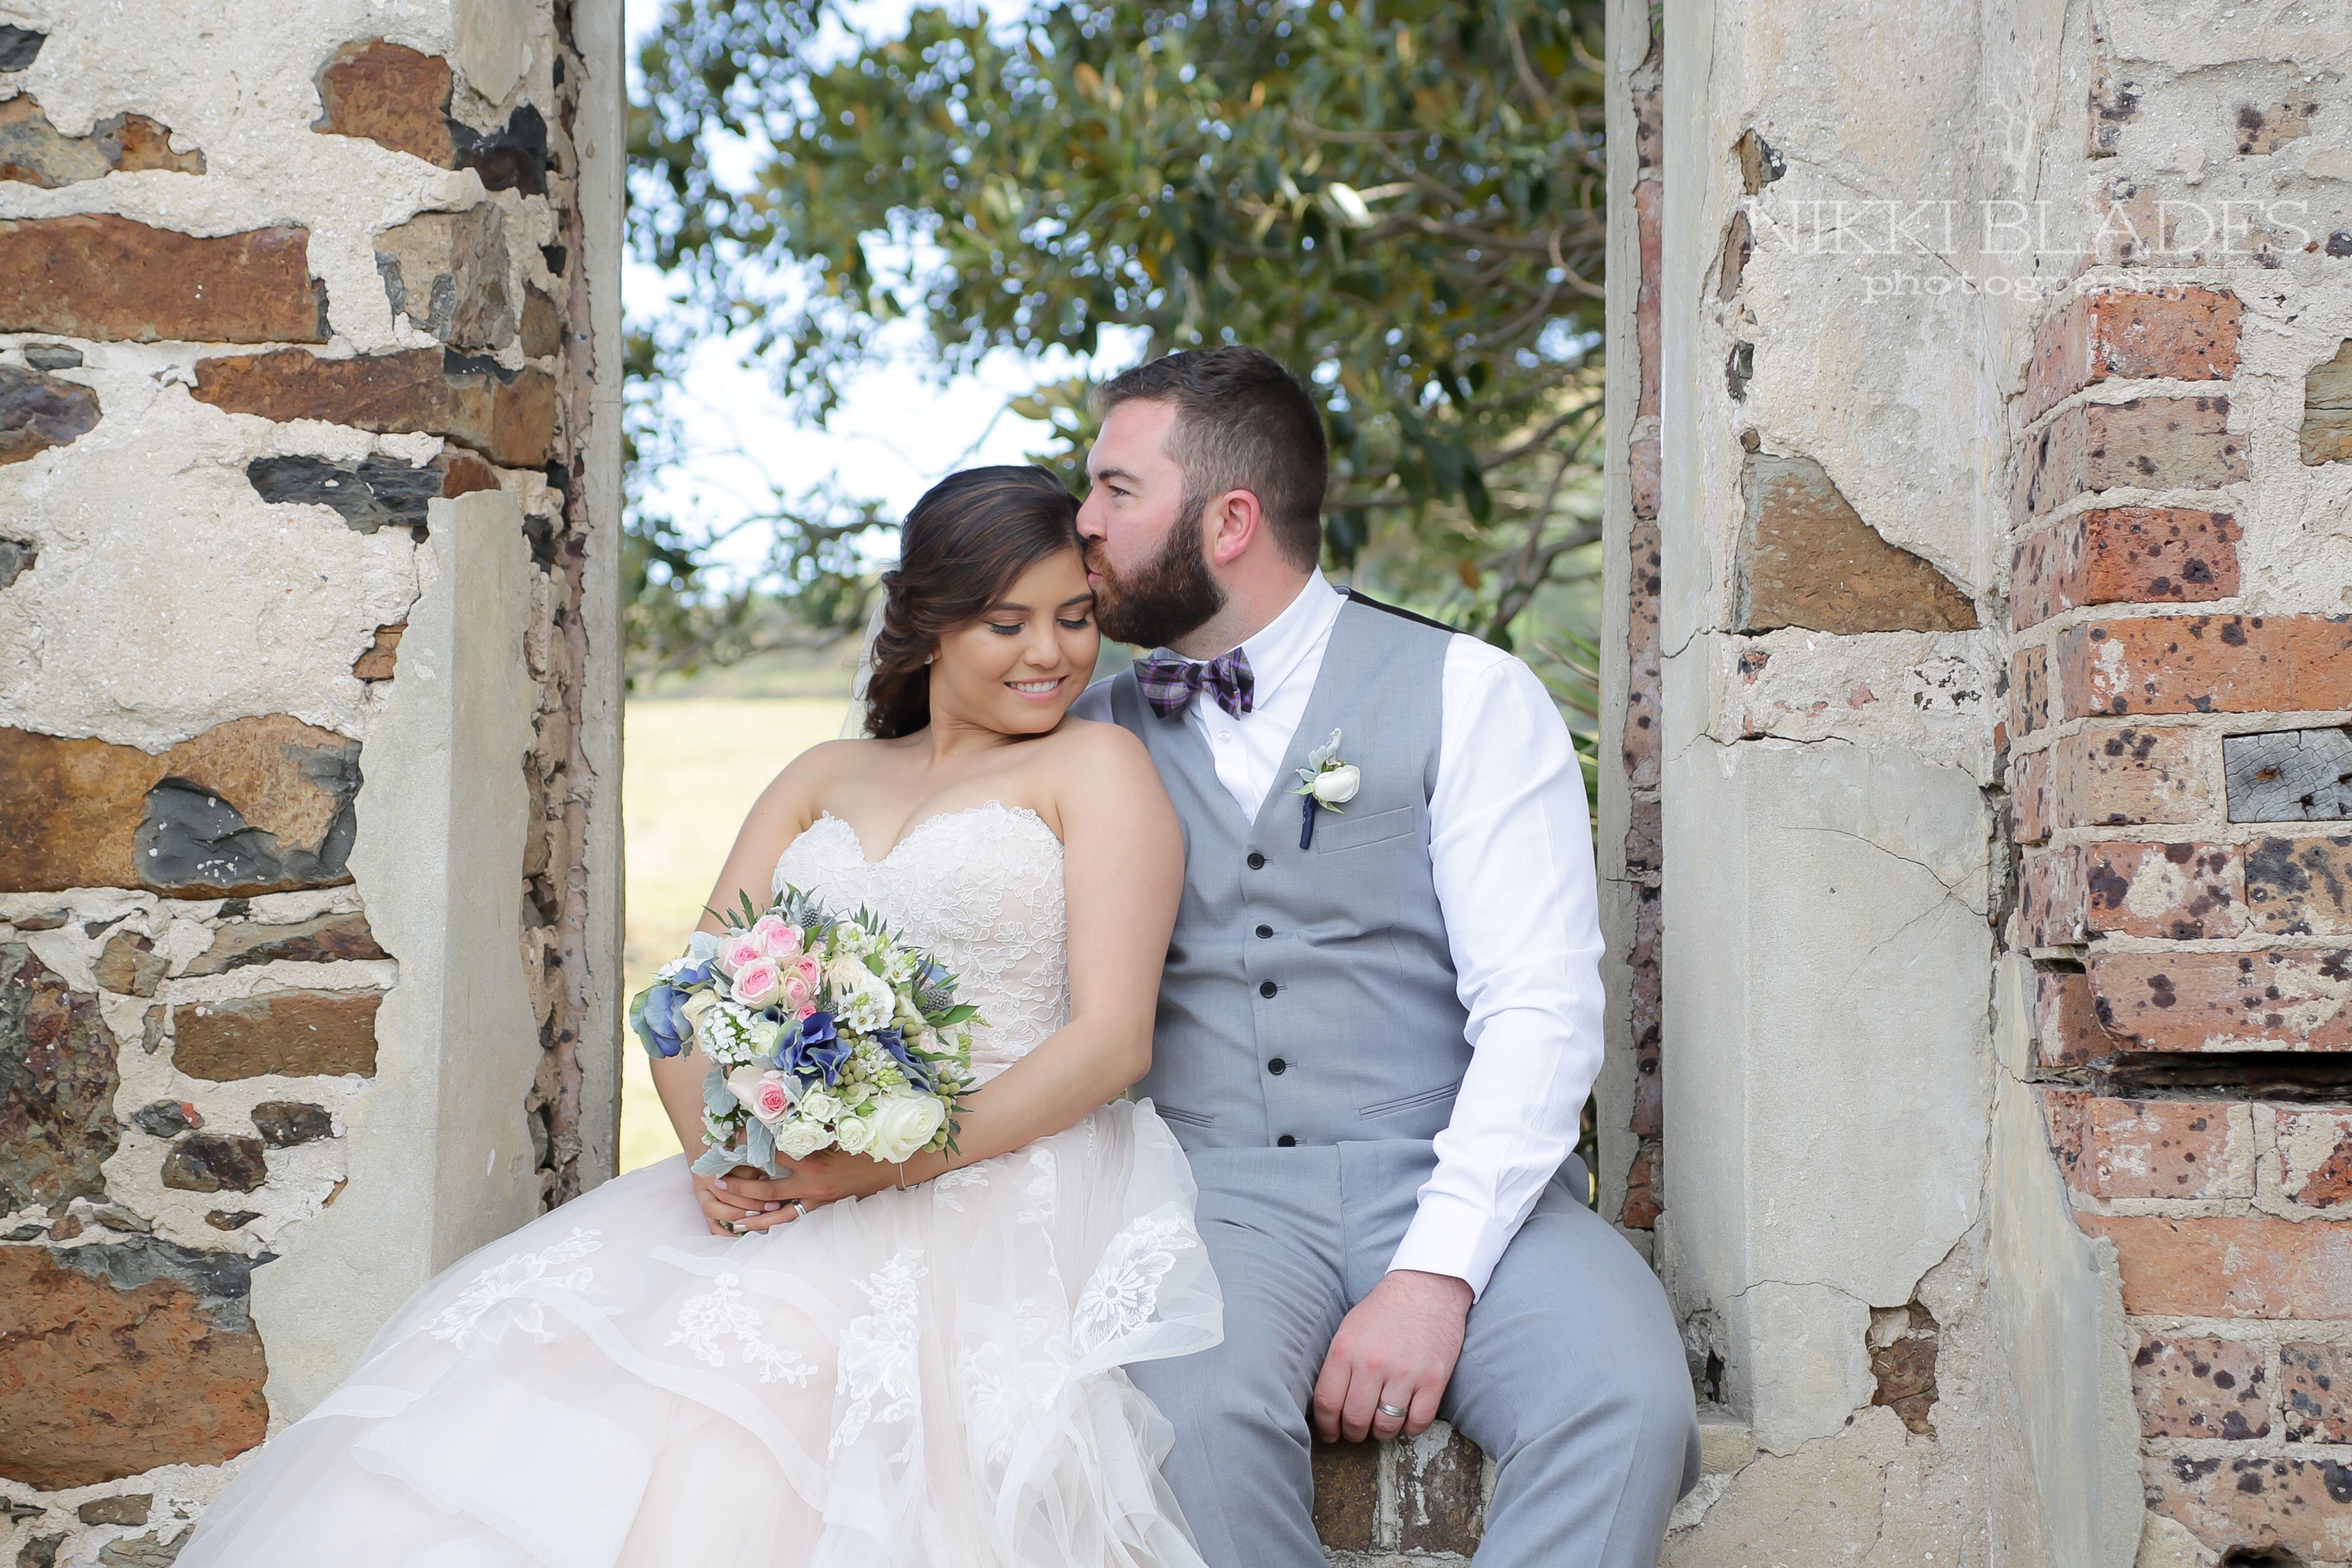 Gladstone Wedding Photographer Nikki Blades Photography